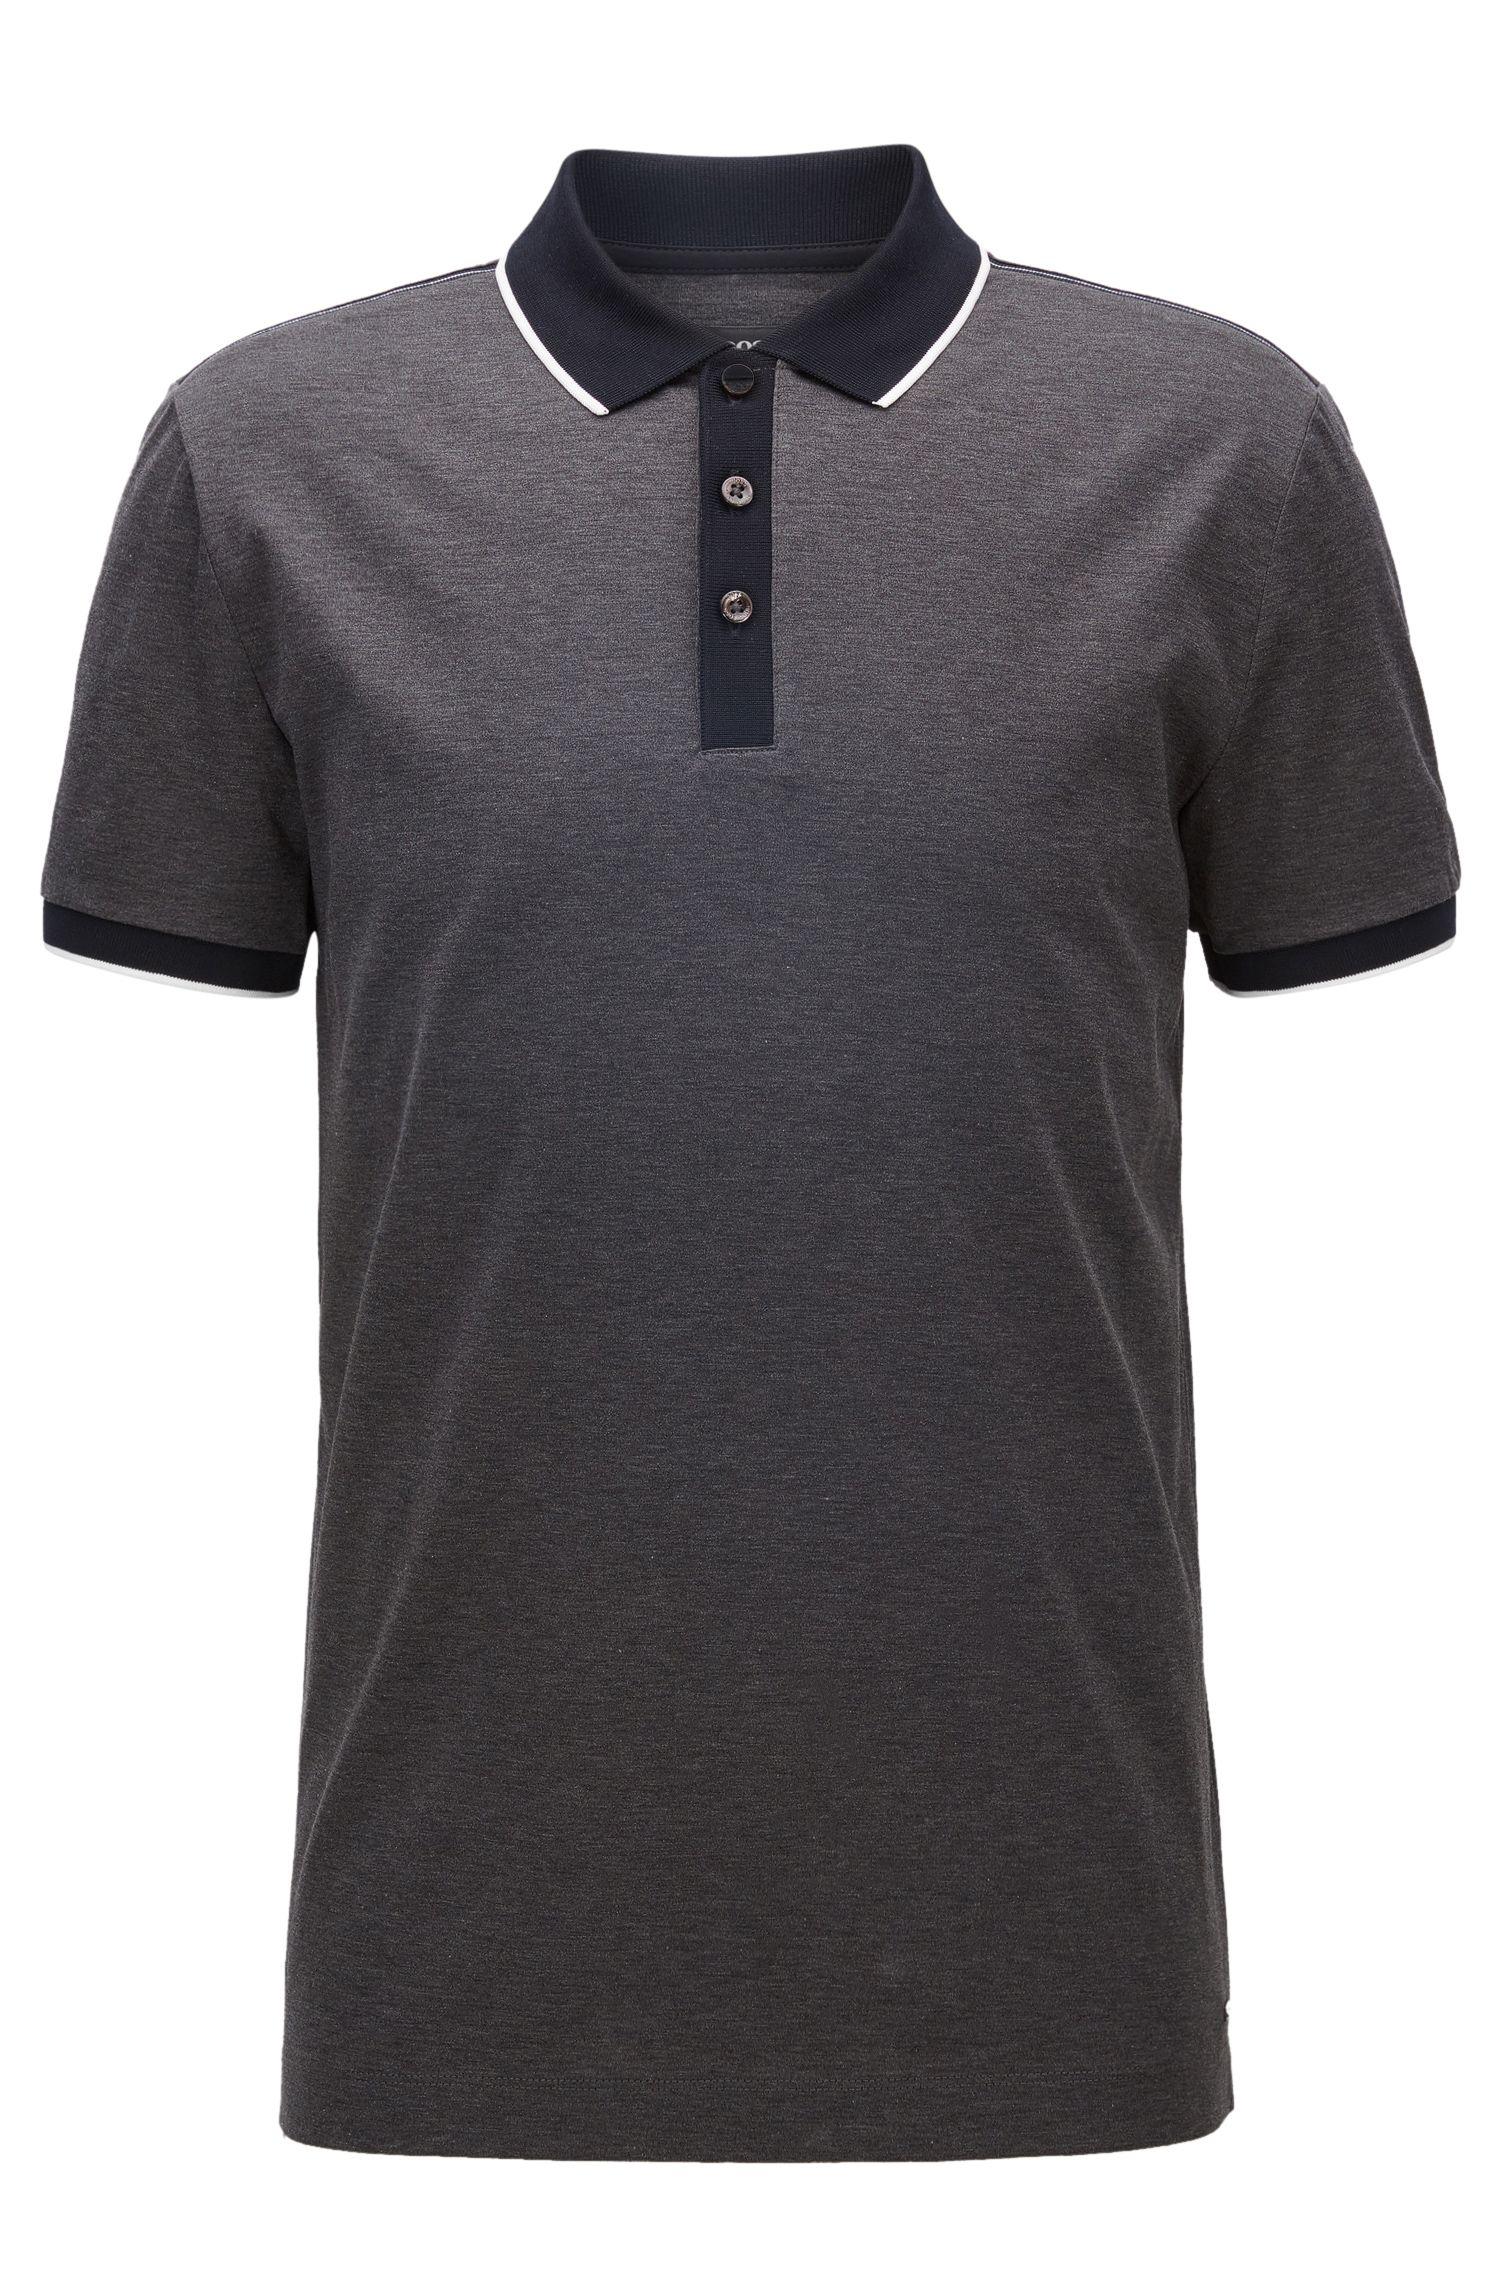 Coloblocked Cotton Polo Shirt, Slim Fit | Phillipson